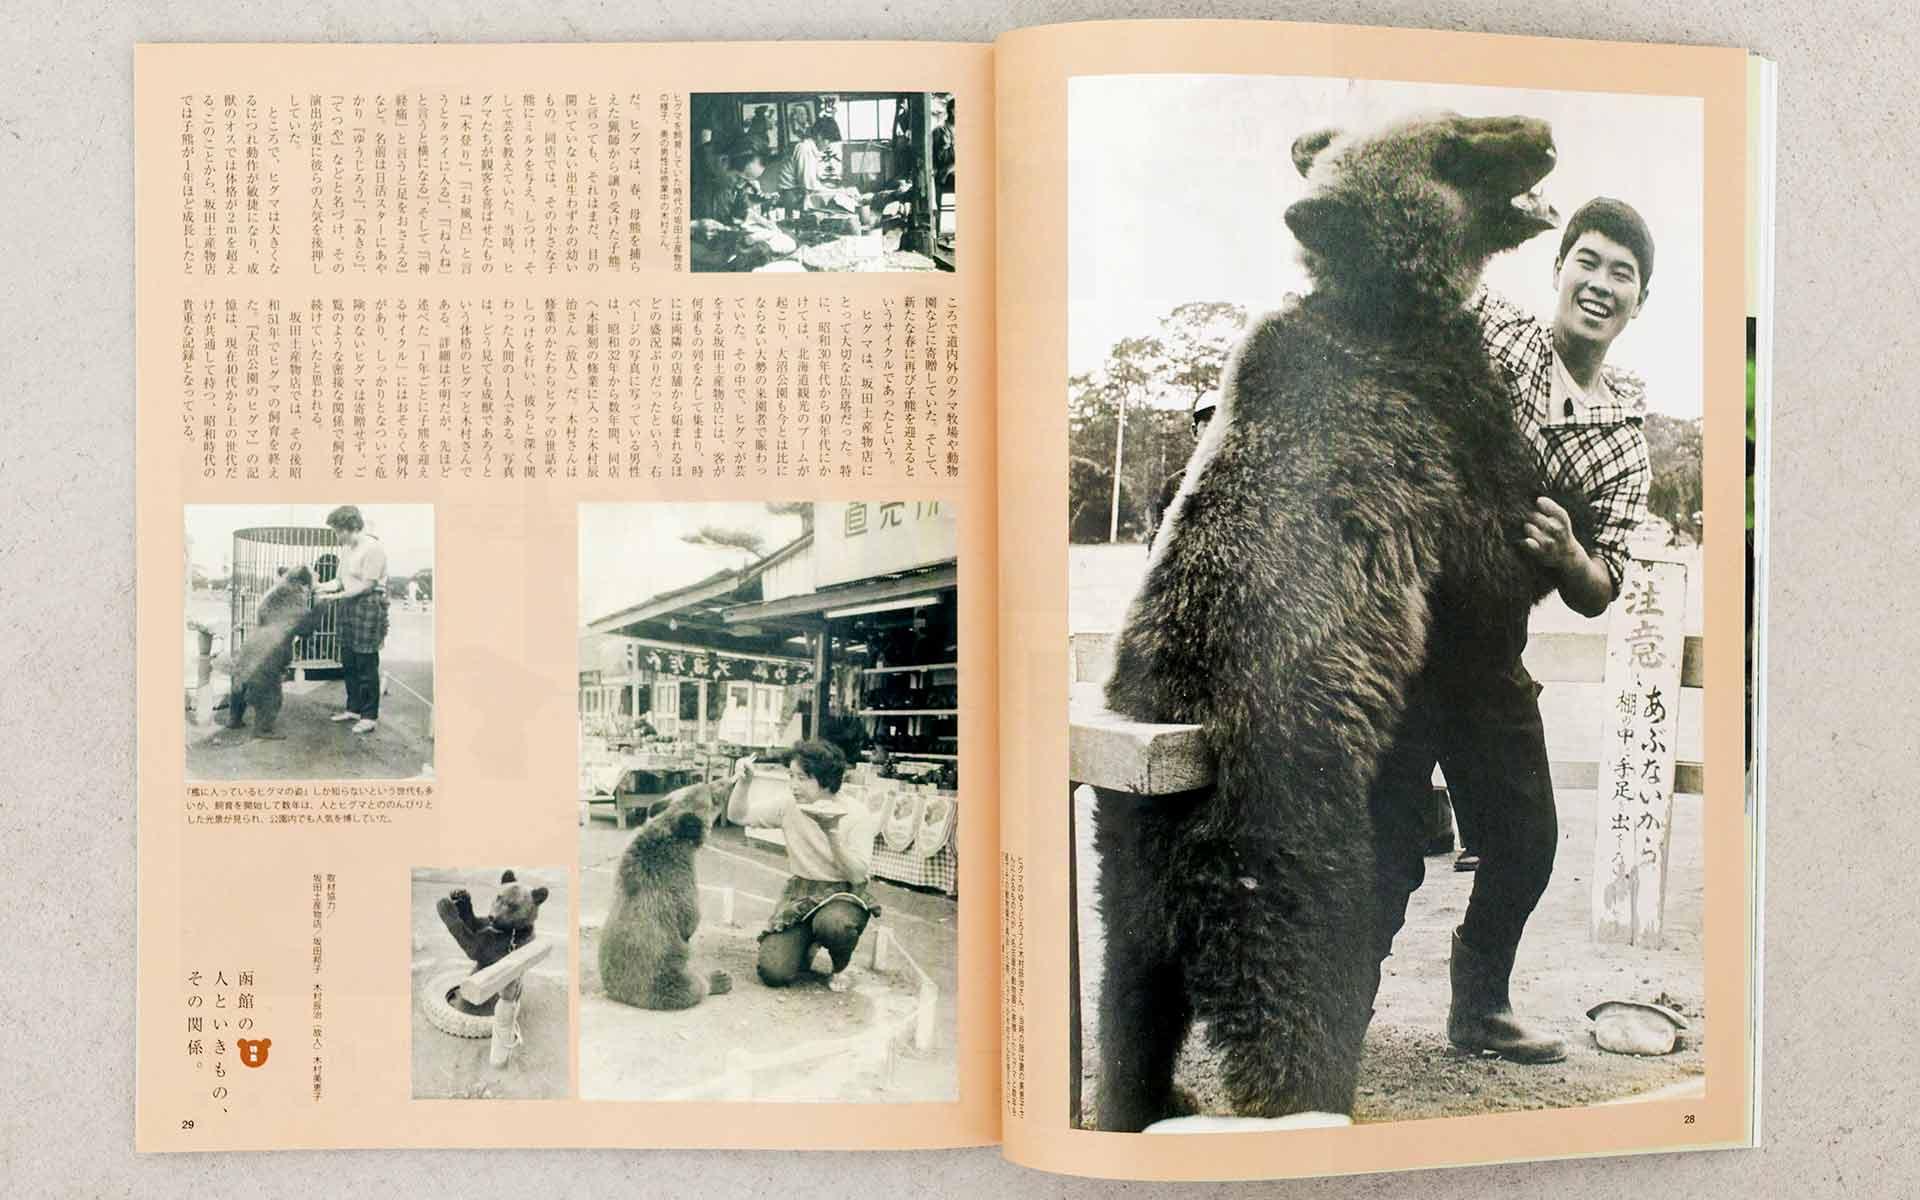 vol.31/2016年6月号「函館の人といきもの、その関係」